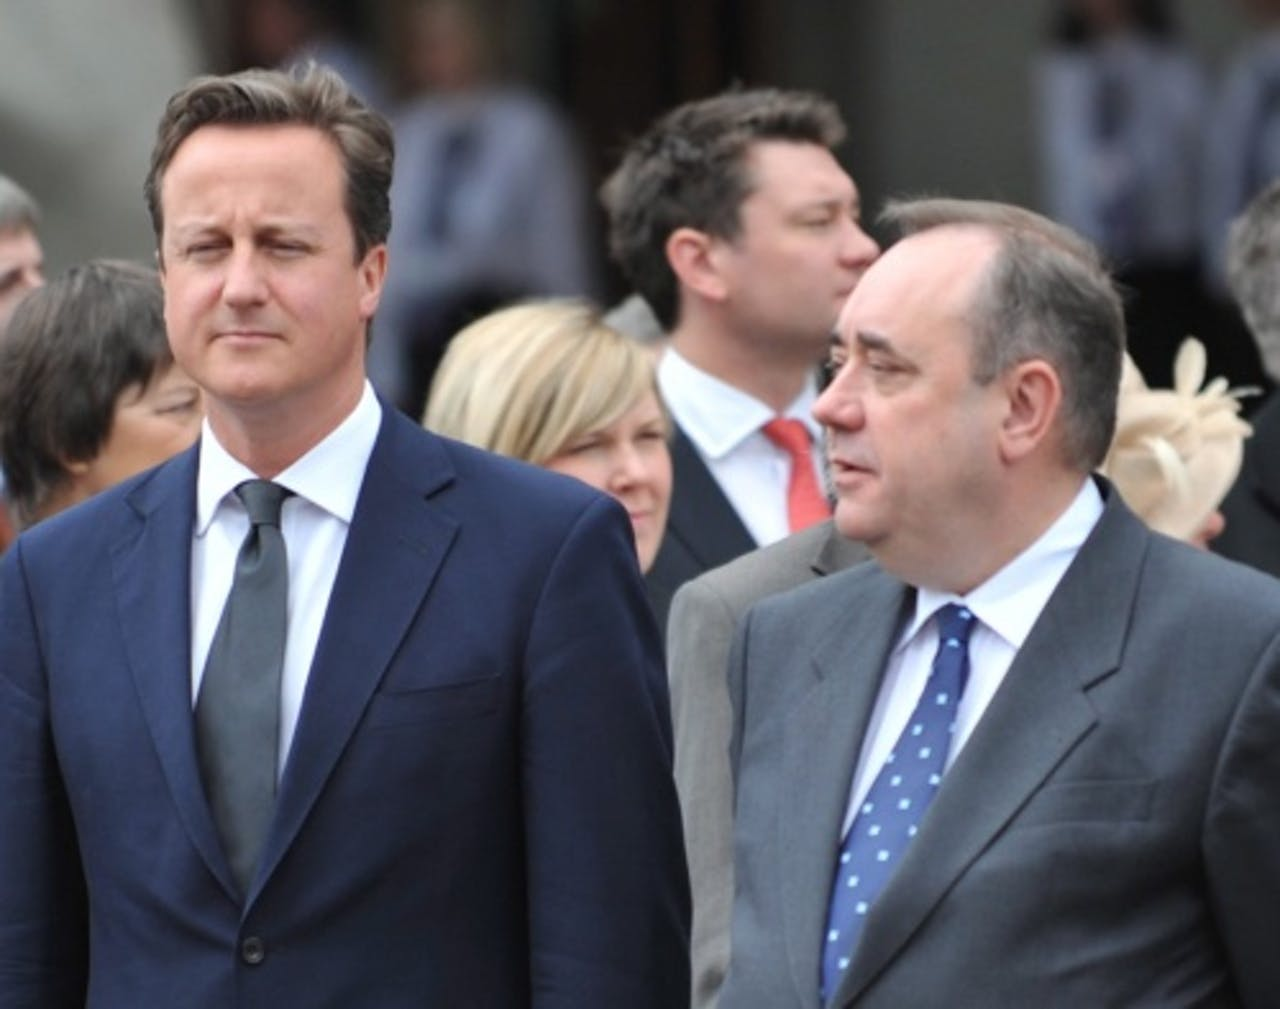 De Schotse premier Alex Salmond (R) en de Britse premier David Cameron (L). EPA